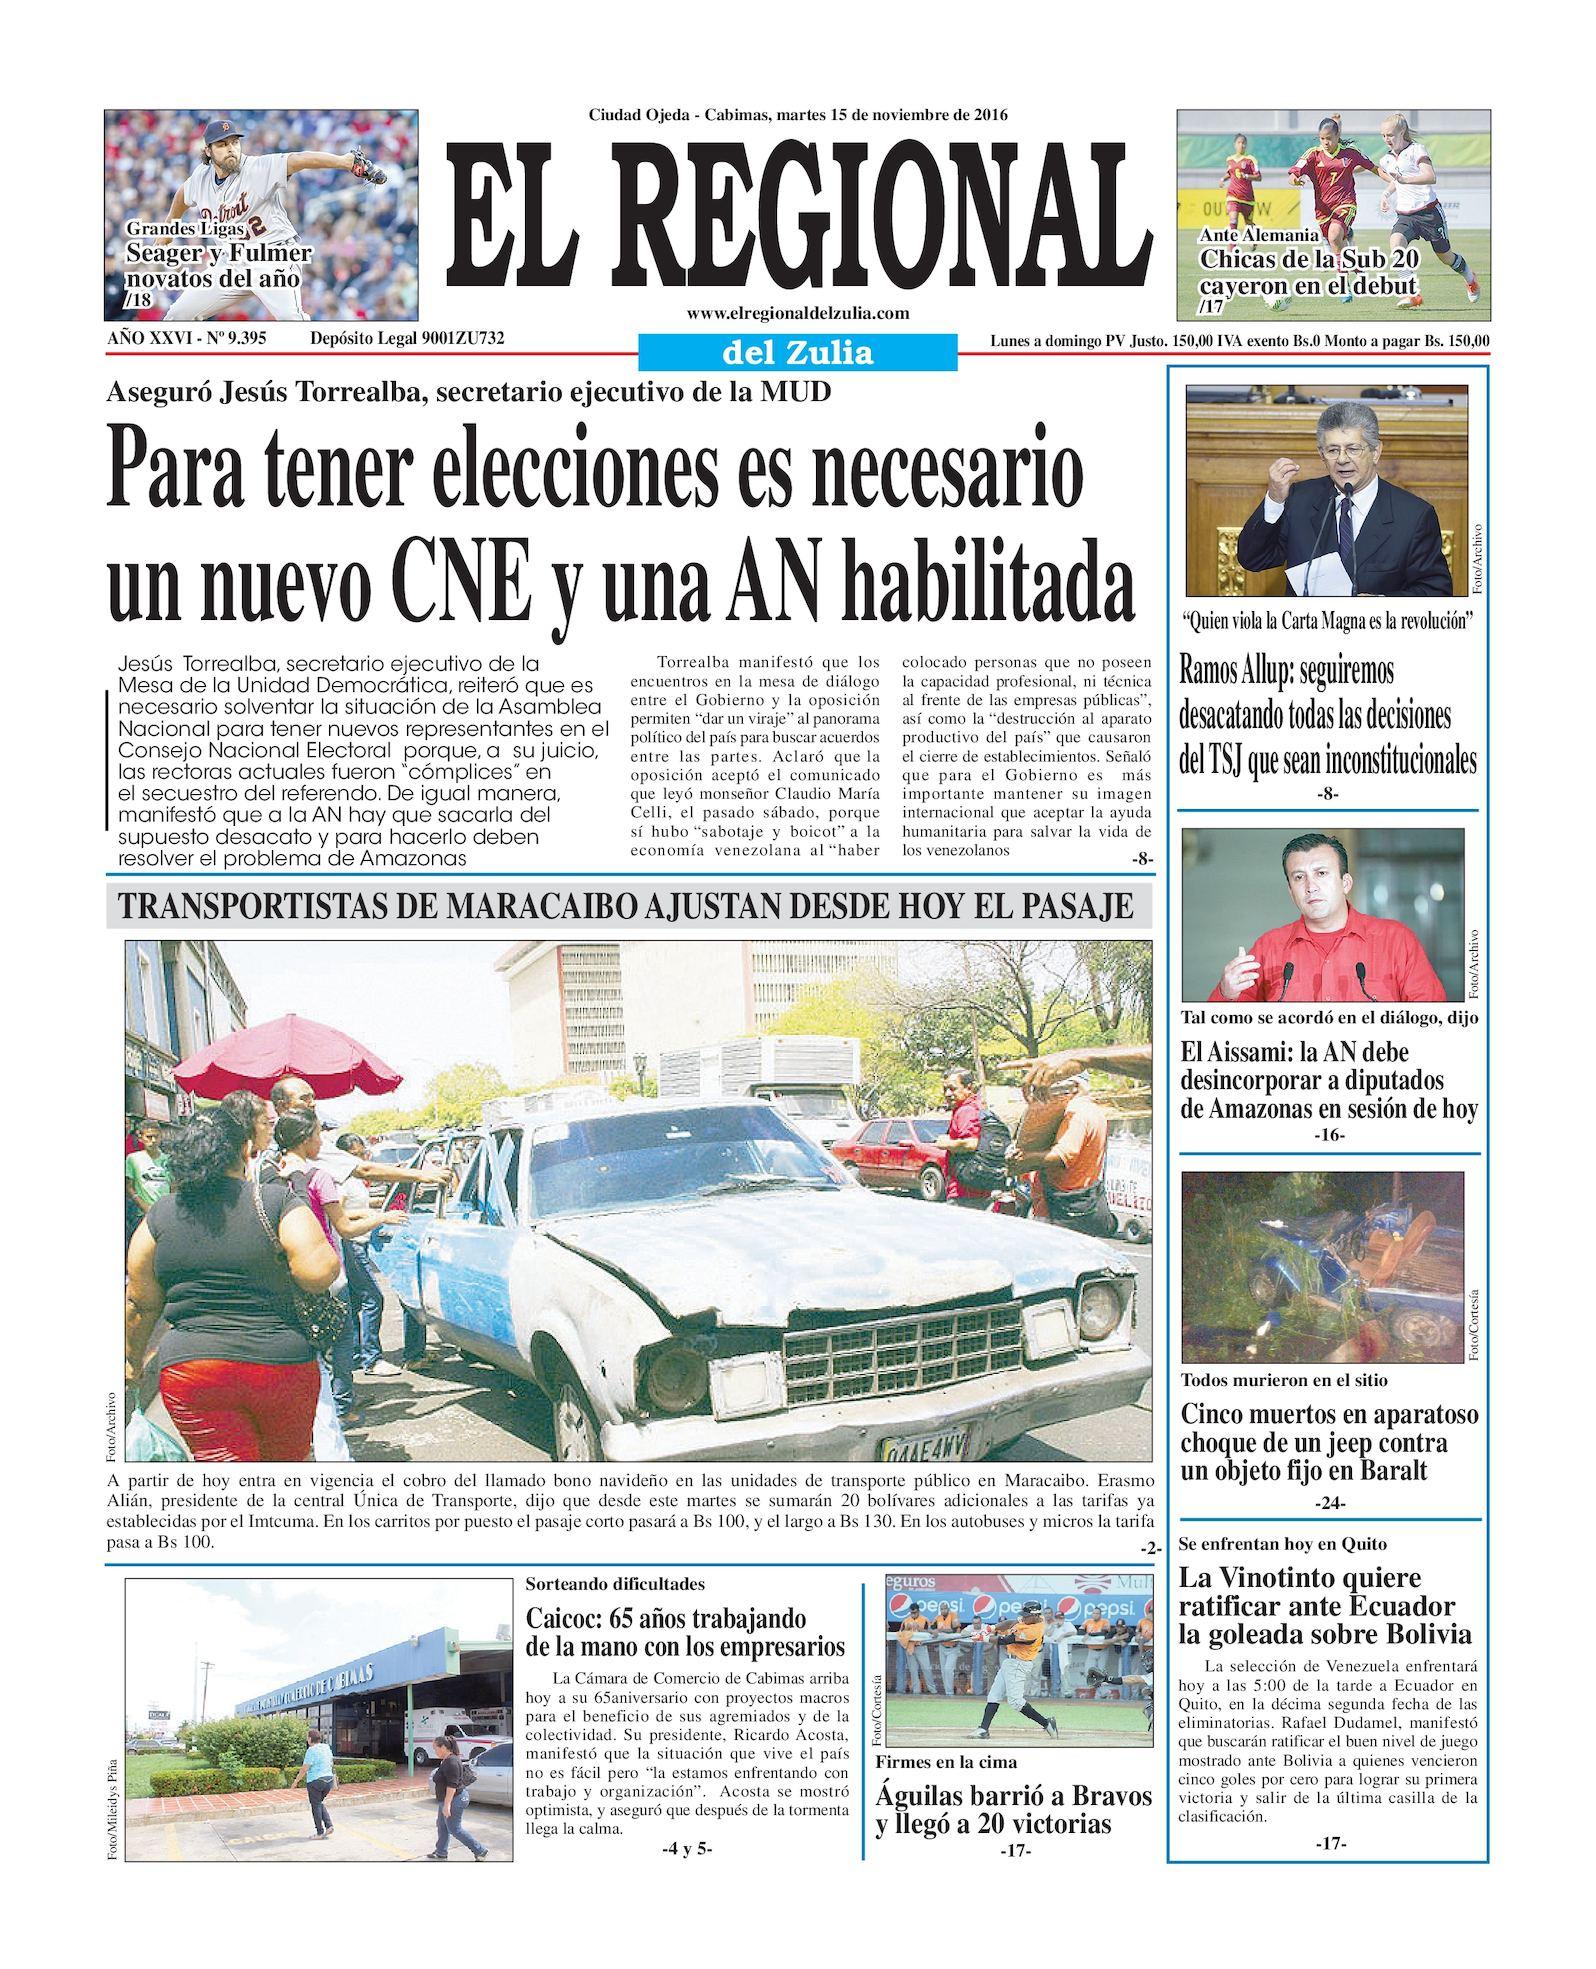 Calaméo - El Regional del Zulia 15-11-2016